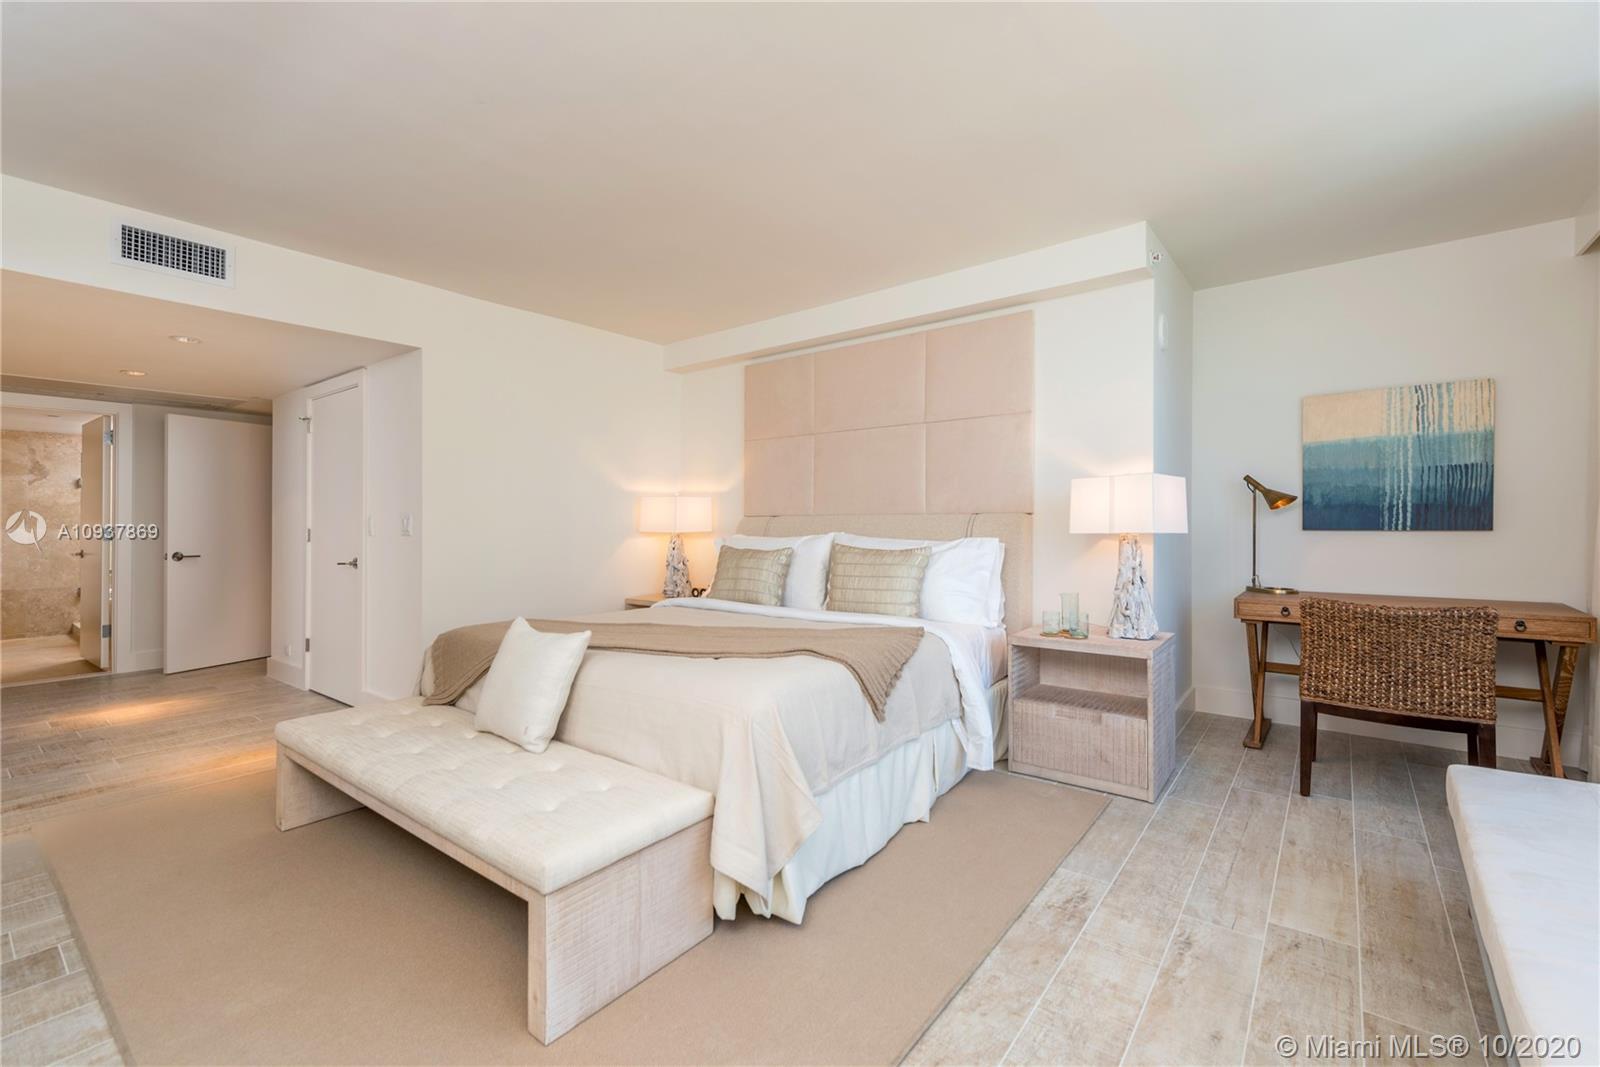 1 Hotel & Homes #1015 - 102 24th St #1015, Miami Beach, FL 33139